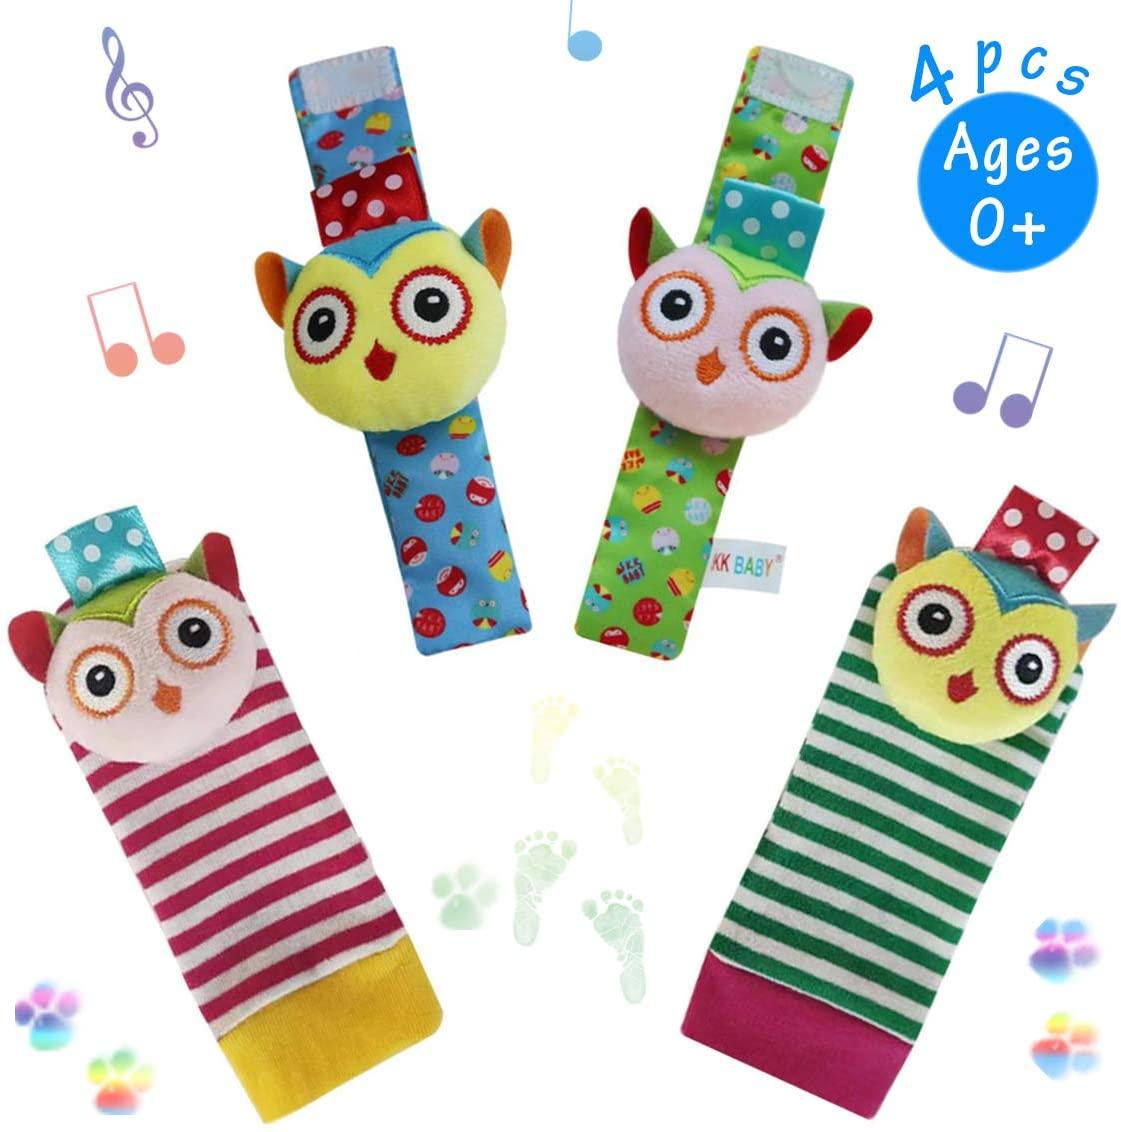 URUTOREO Baby Rattle, Baby Wrist Rattle and Foot Rattles Finder Socks Set, Developmental Soft Animal Rattles Owl Socks Toys Infant Baby Toys (4 Pcs)